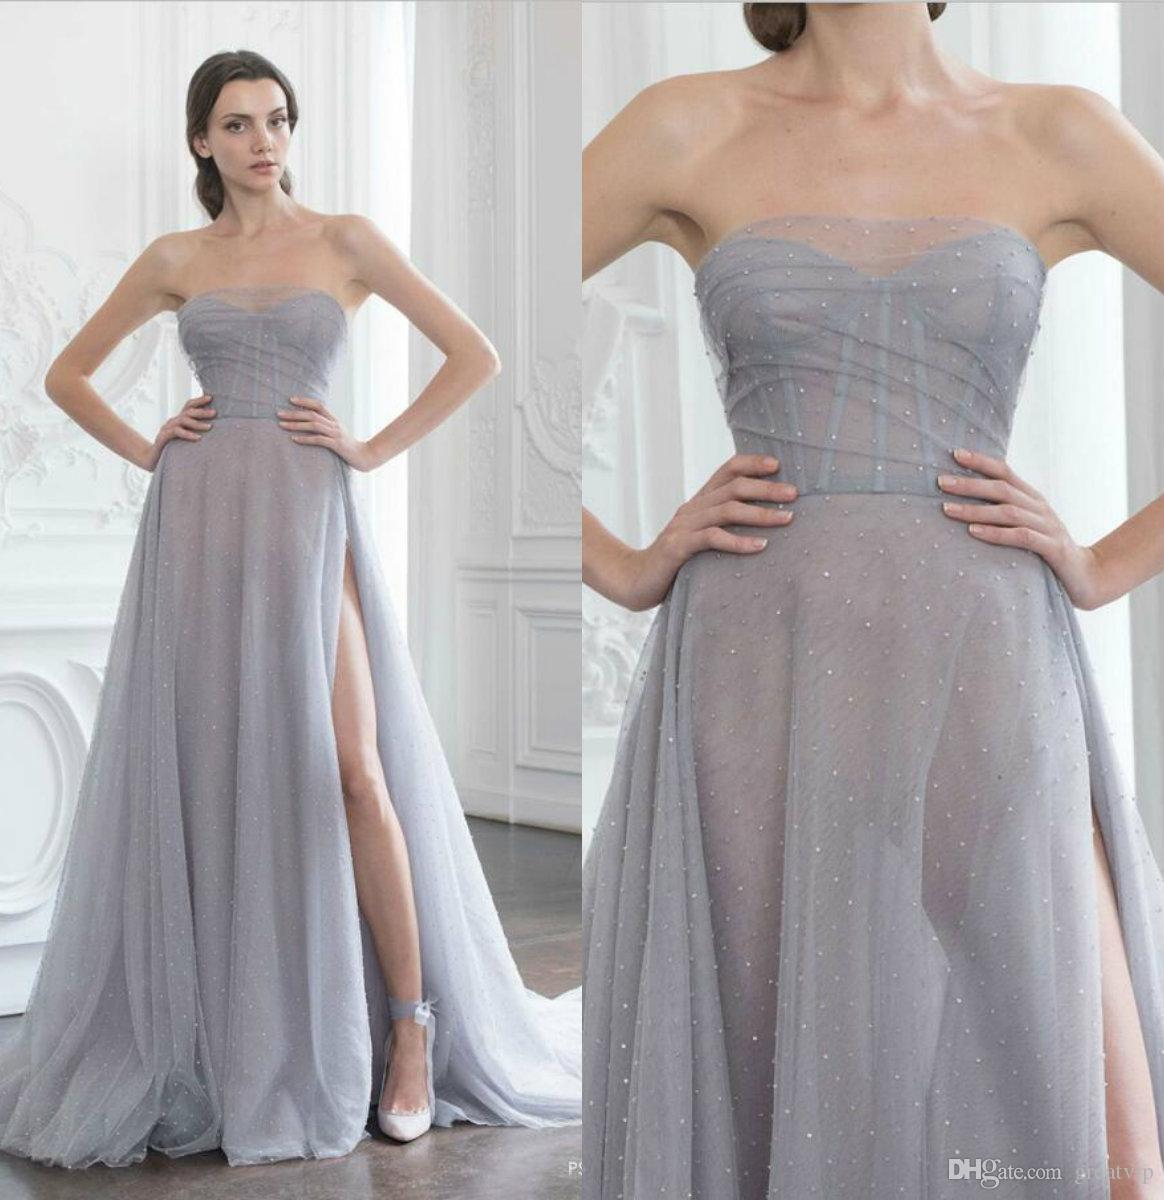 Paolo Sebastian 2019 Evening Dresses Beaded High Split Sweetheart Sexy  Bling Prom Dress Party Bridal Guest Gowns Plus Size Robes De Soirée Evening  Dresses ... e7b107b04